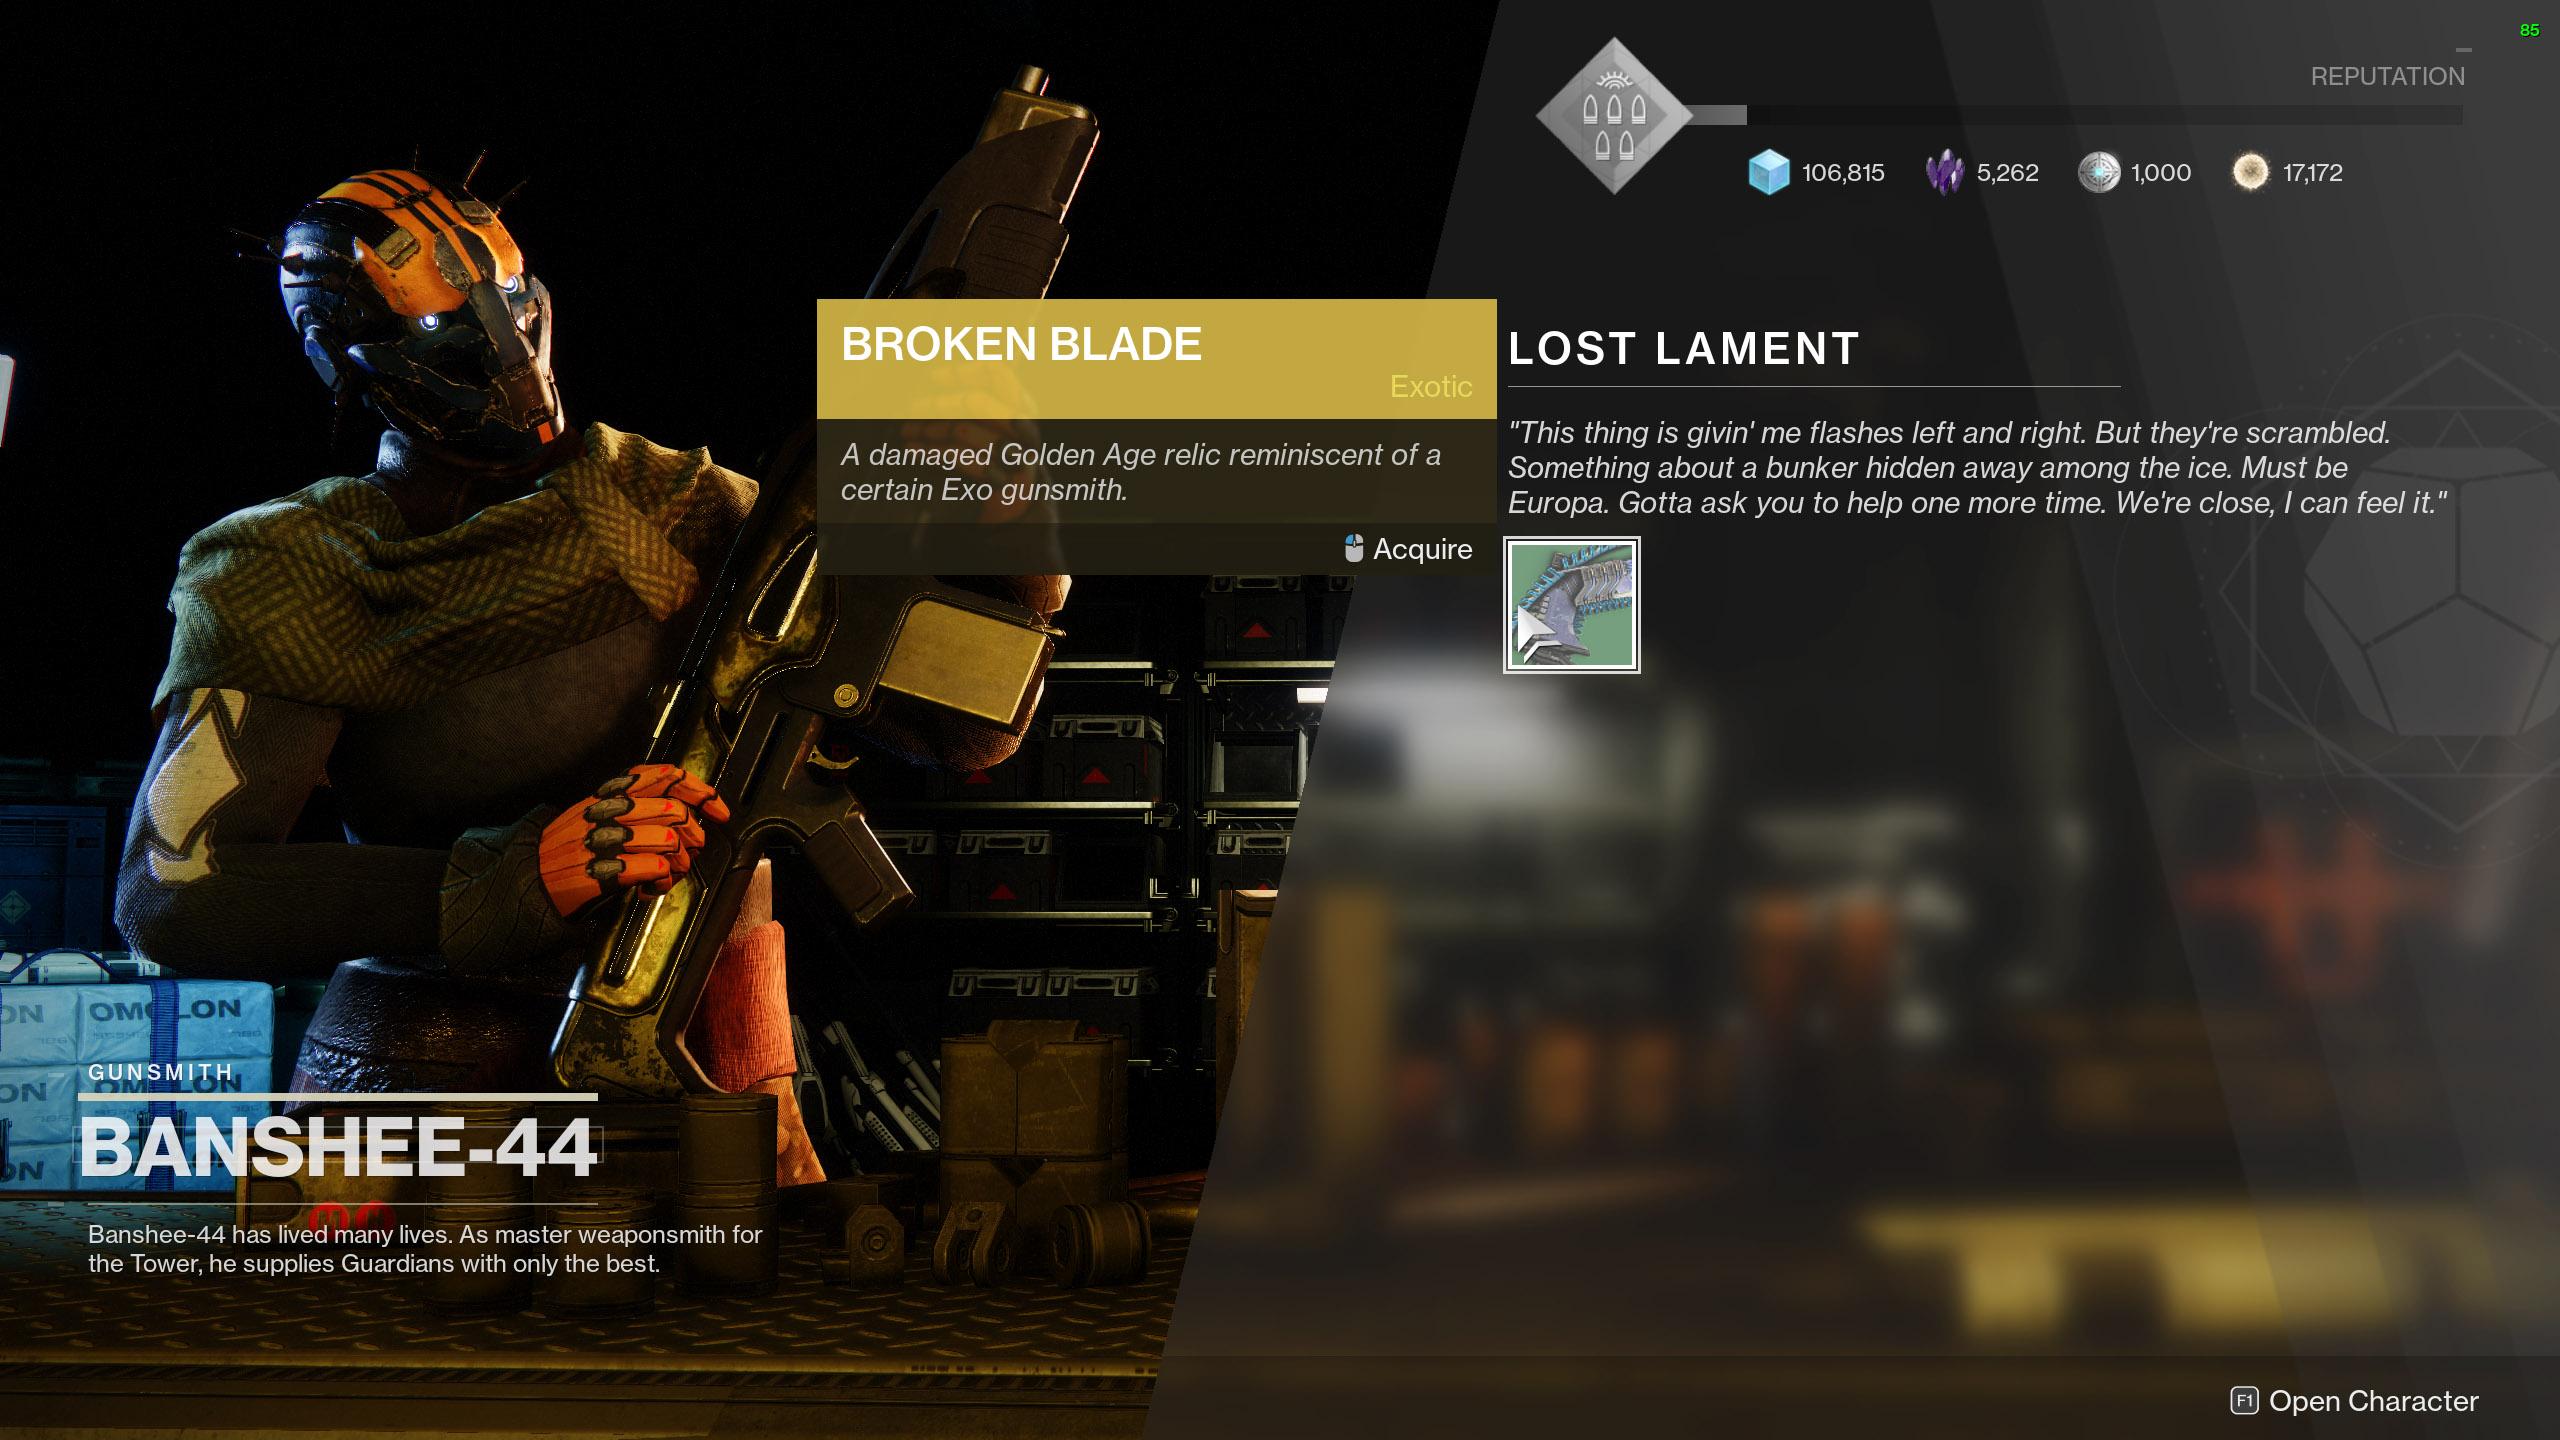 destiny 2 lost lament broken blade